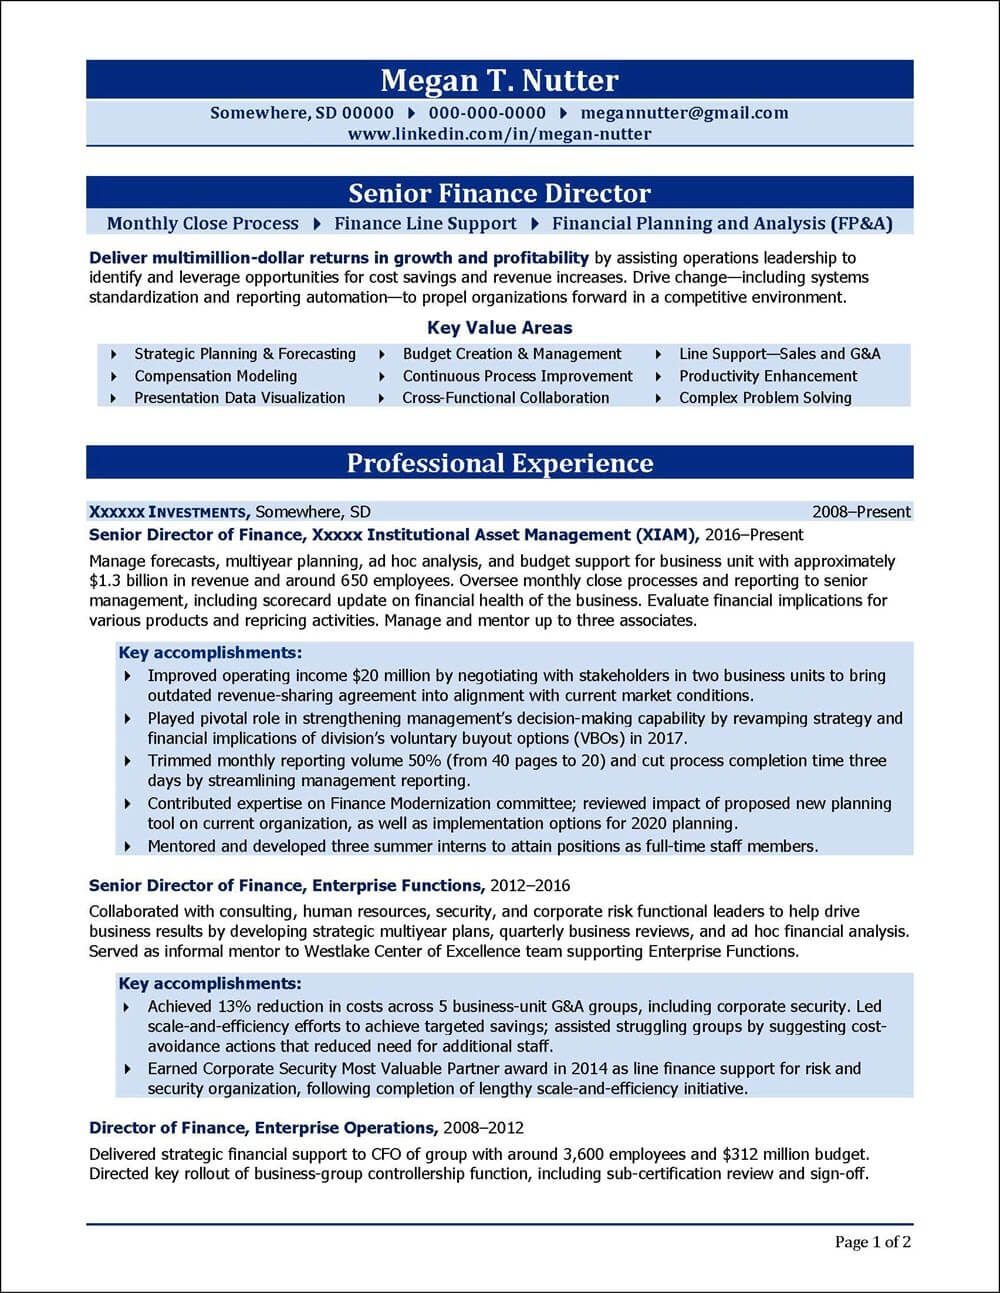 Example resume written for a senior finance director